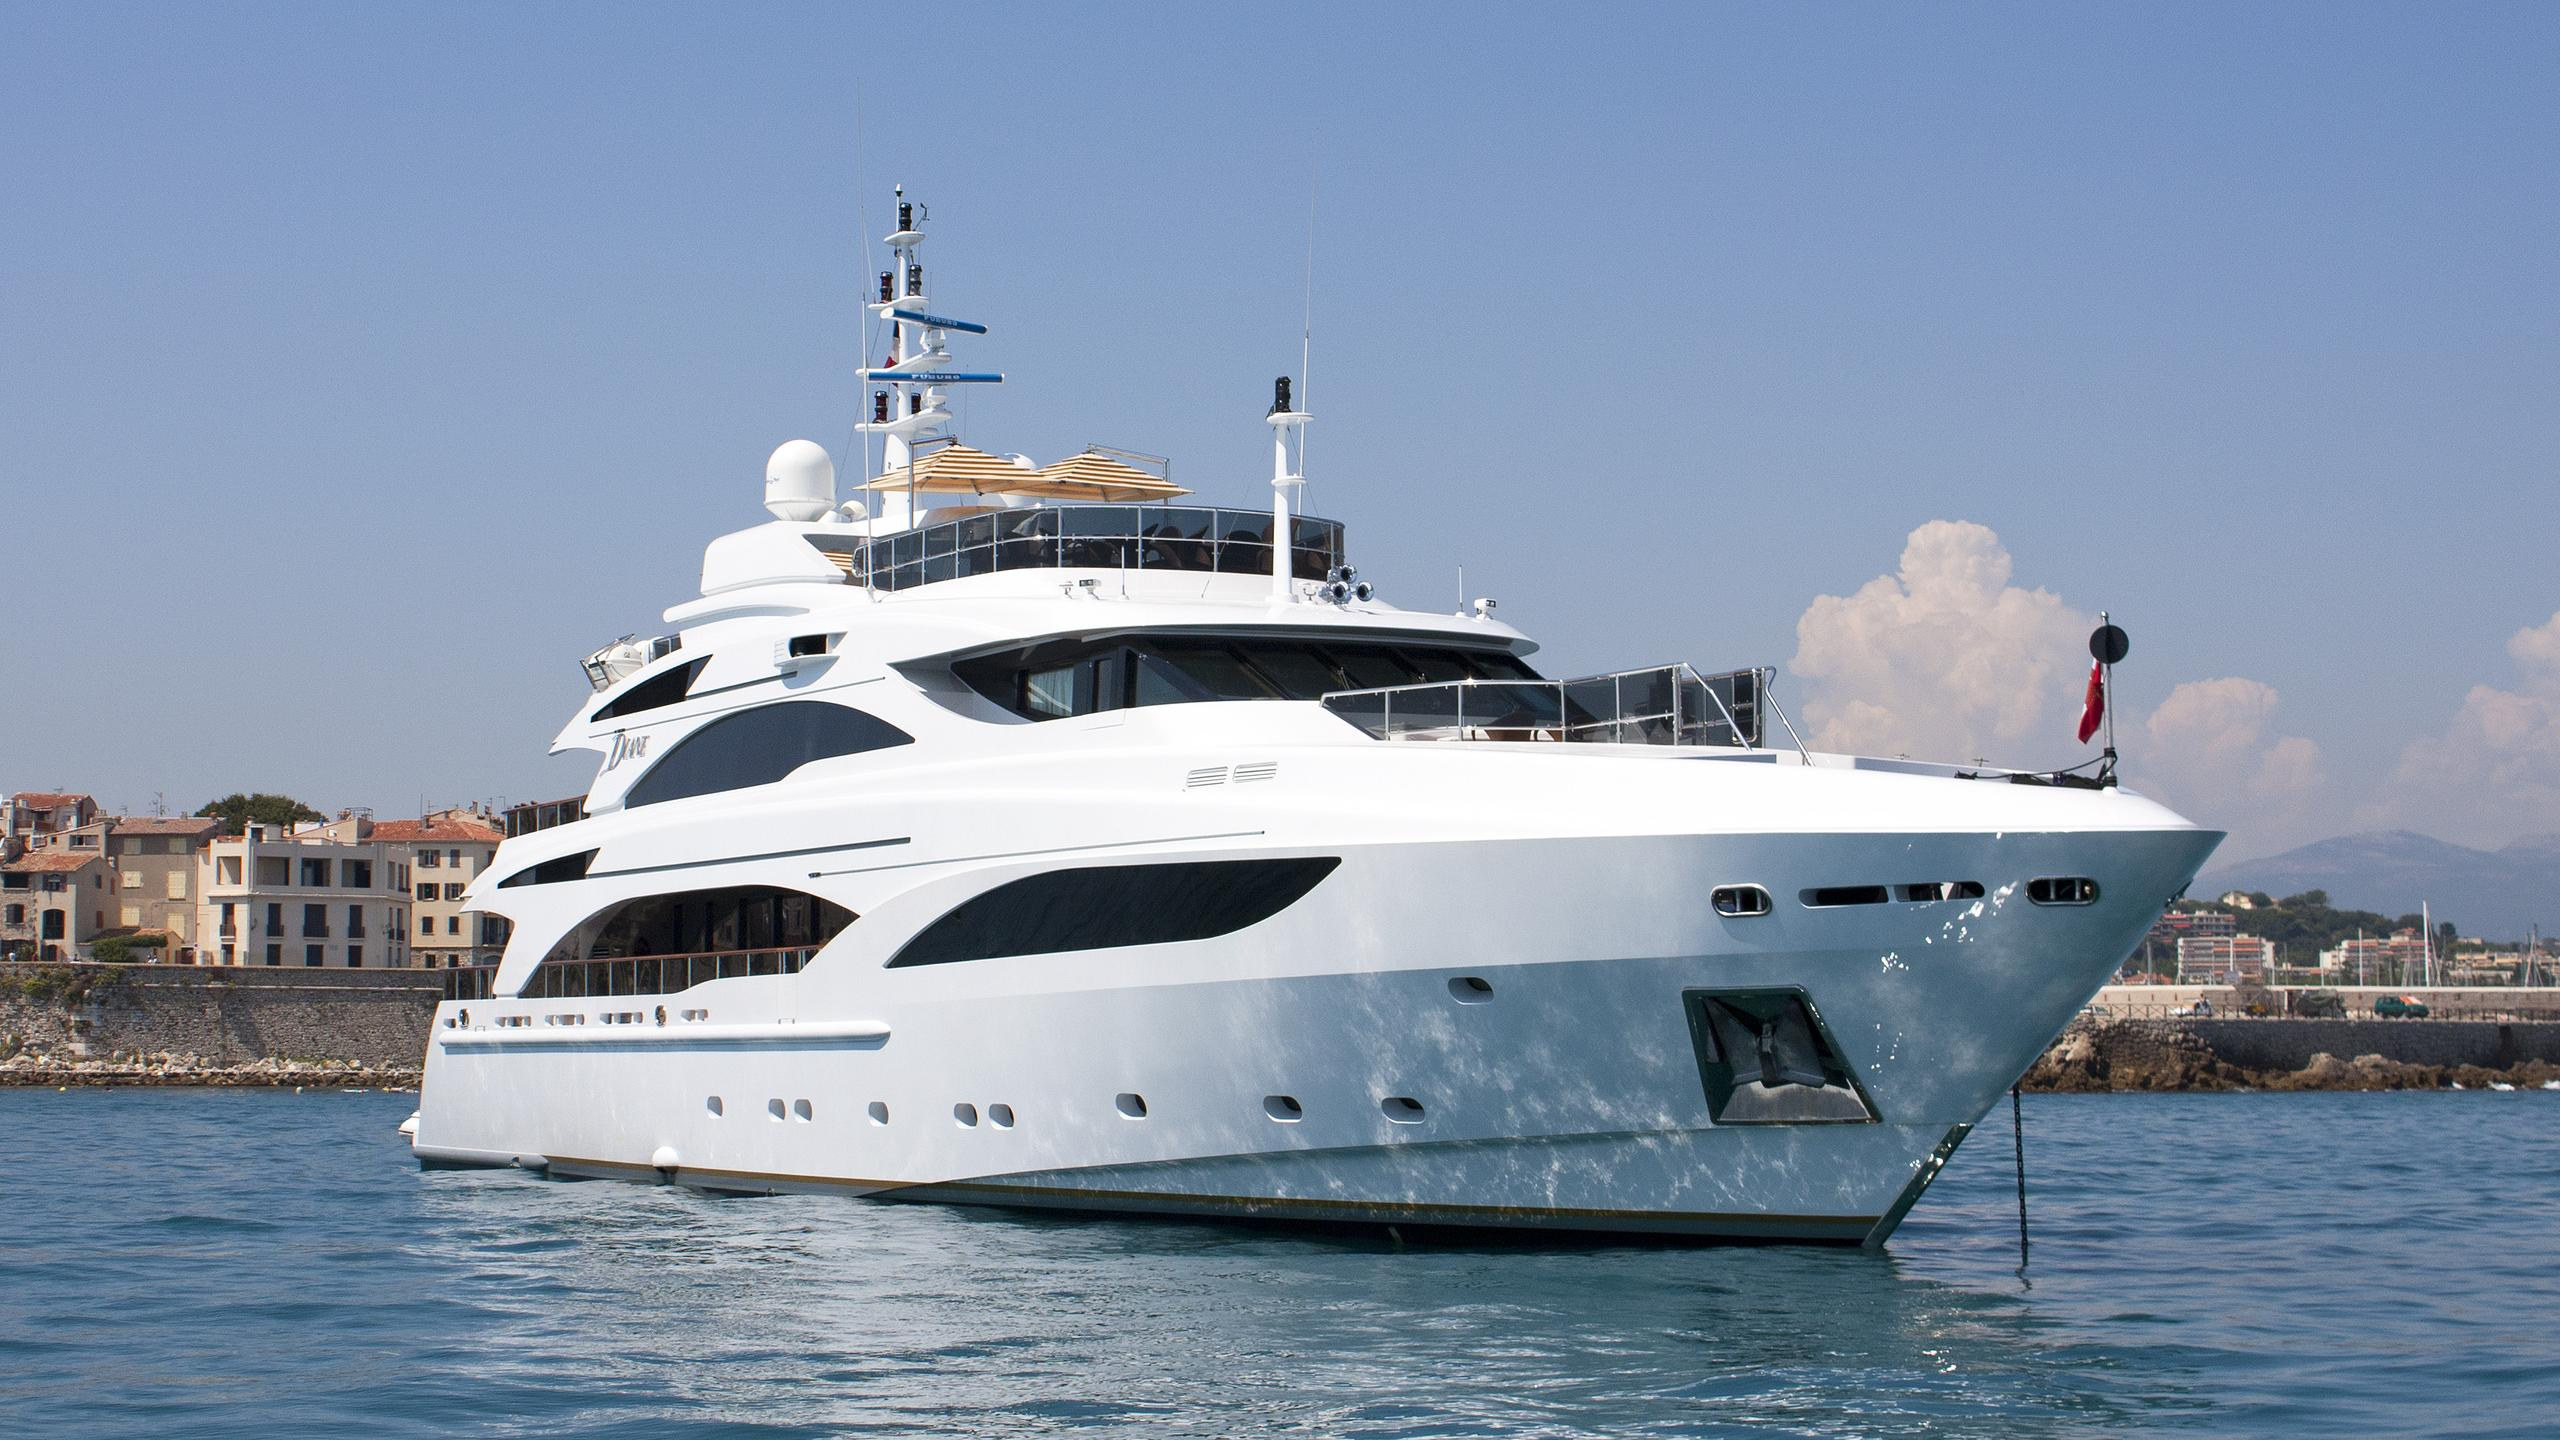 diane-motor-yacht-benetti-2007-43m-bow